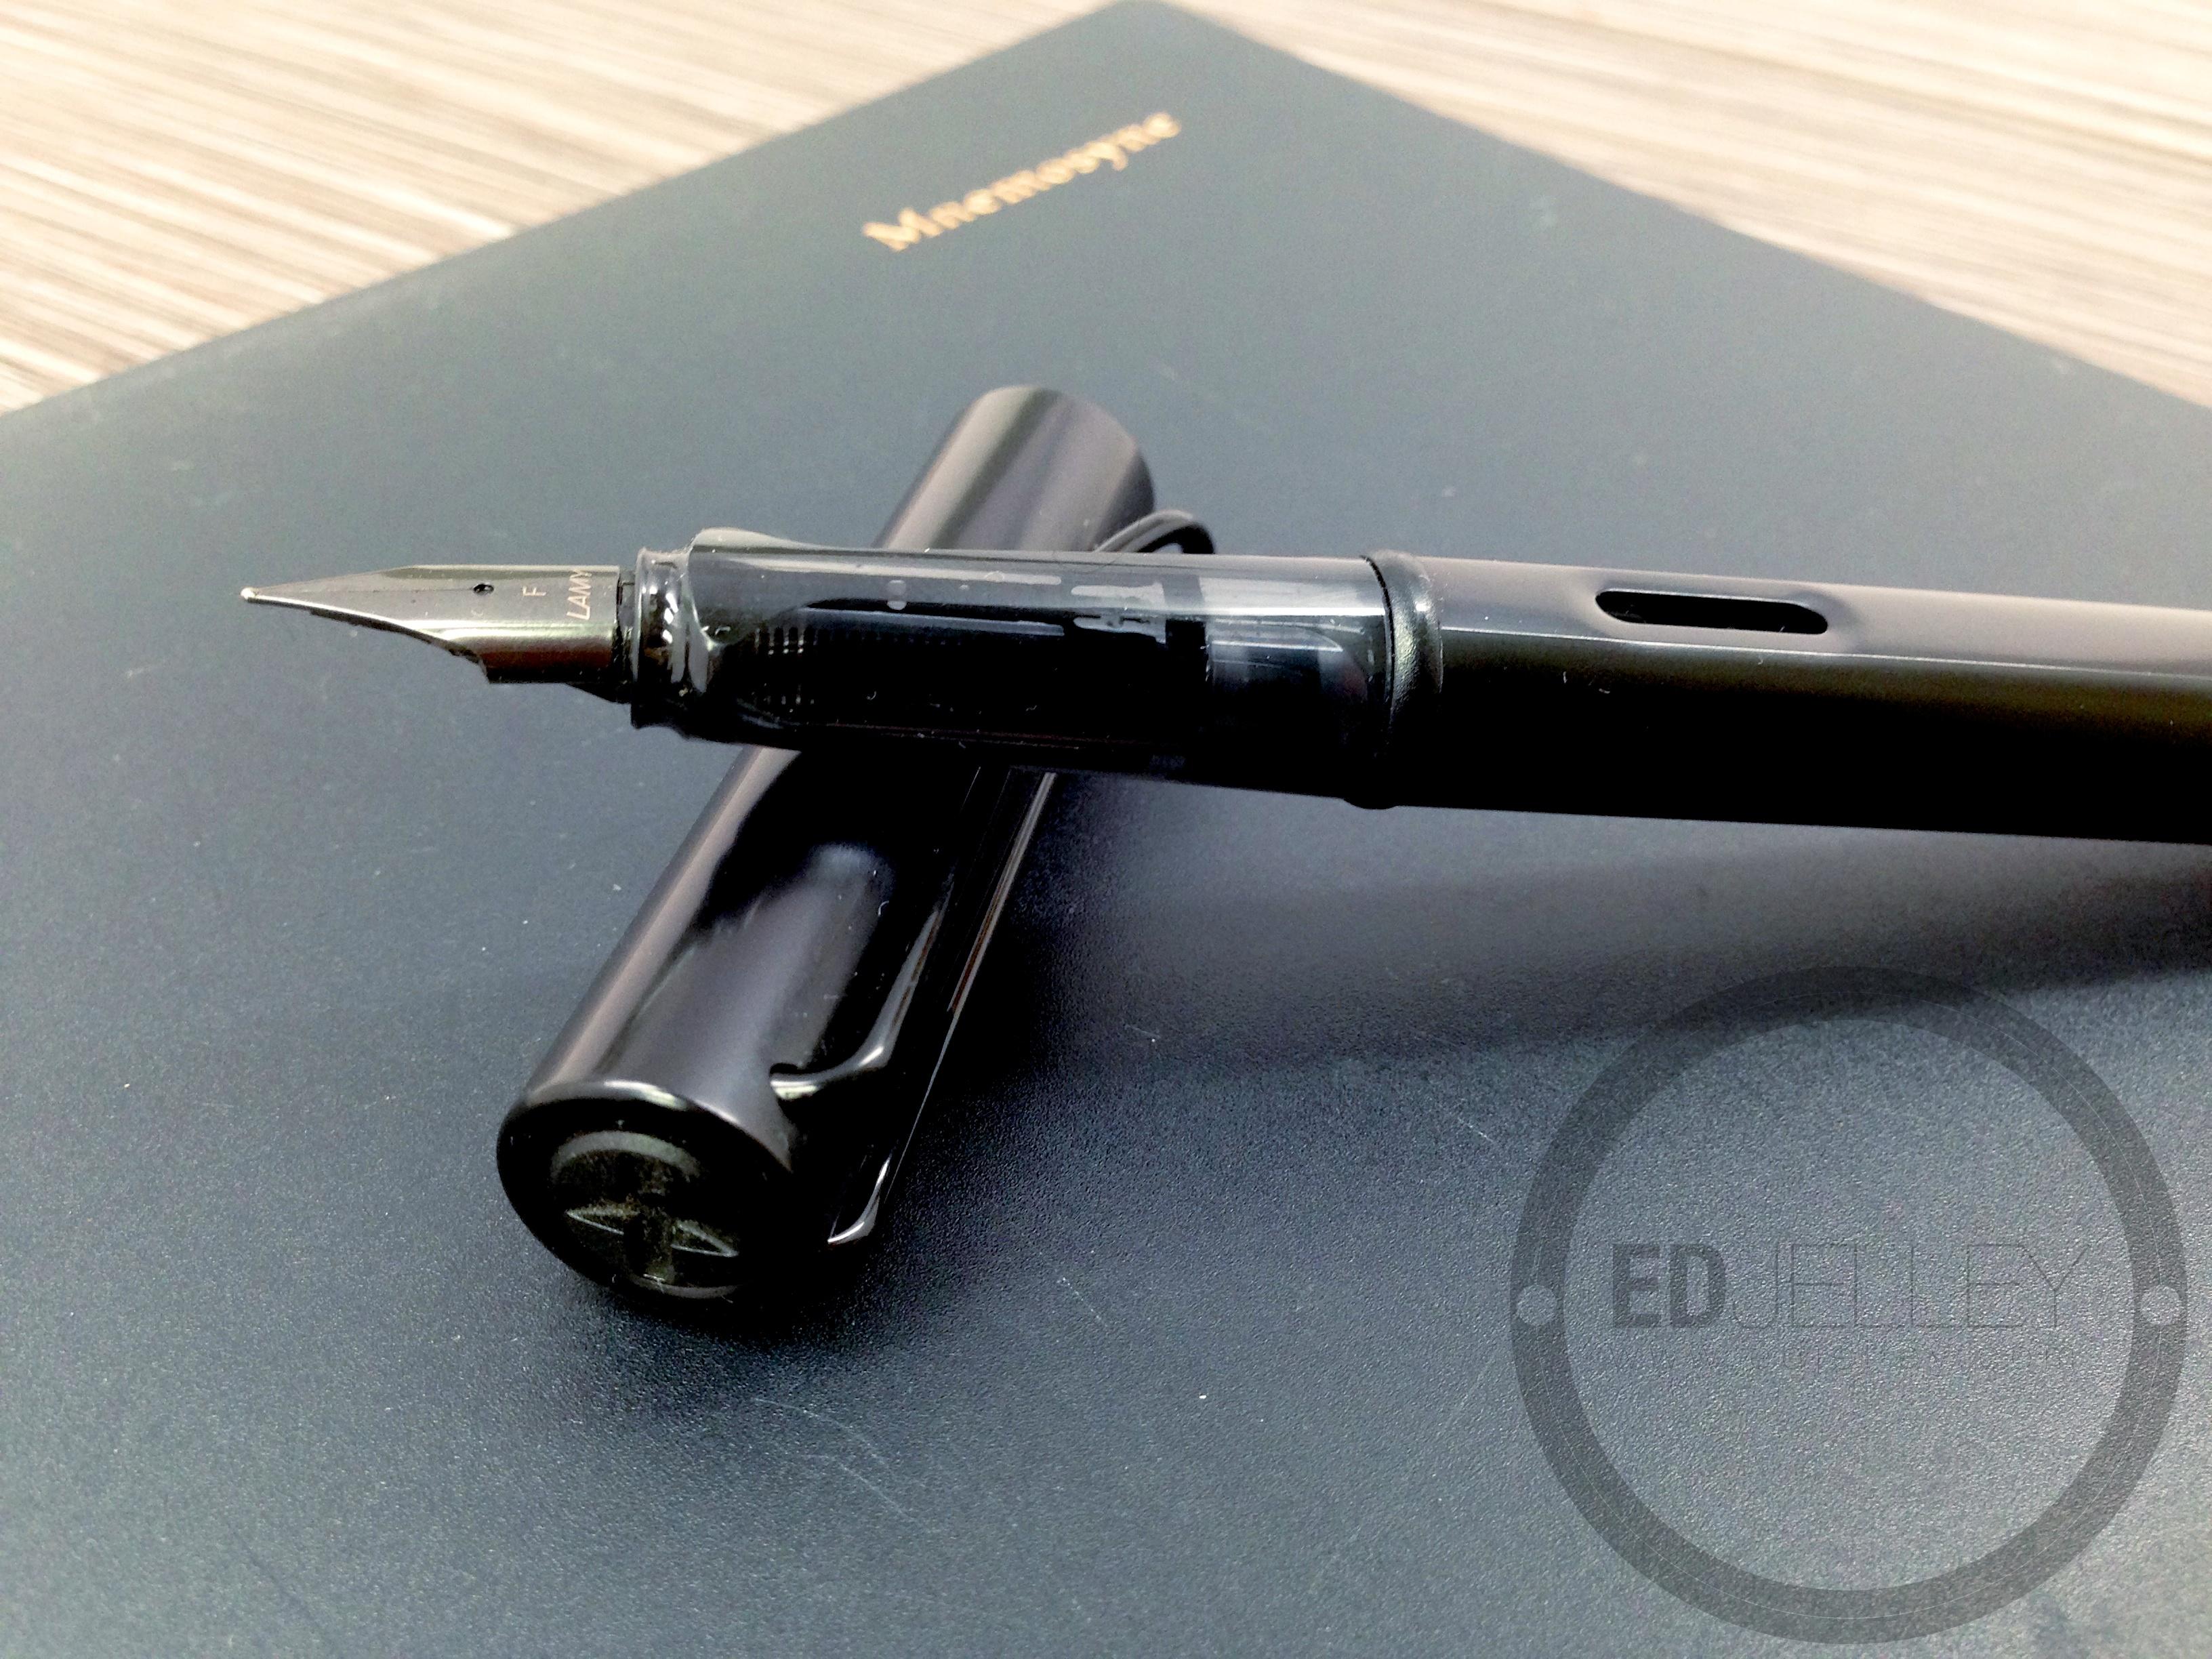 Ngòi bút lamy al-star l71